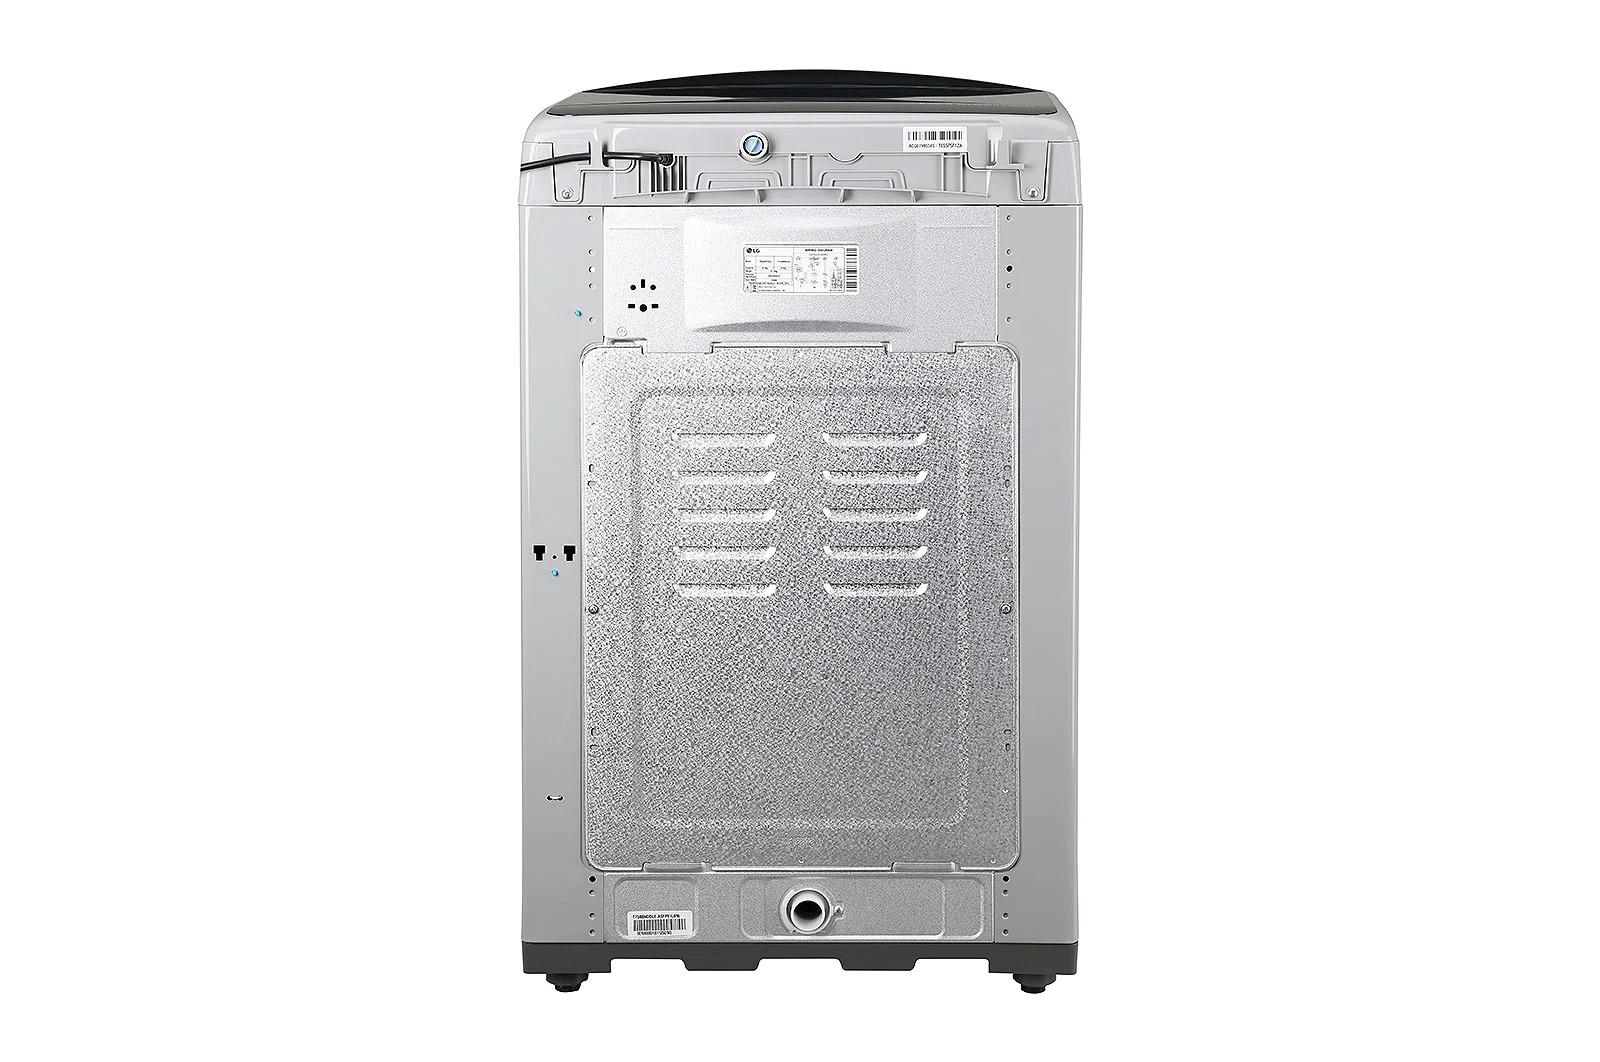 LG (T65SPSF1ZA) 6.5kg, 5 Star, Smart Inverter Technology Top Load